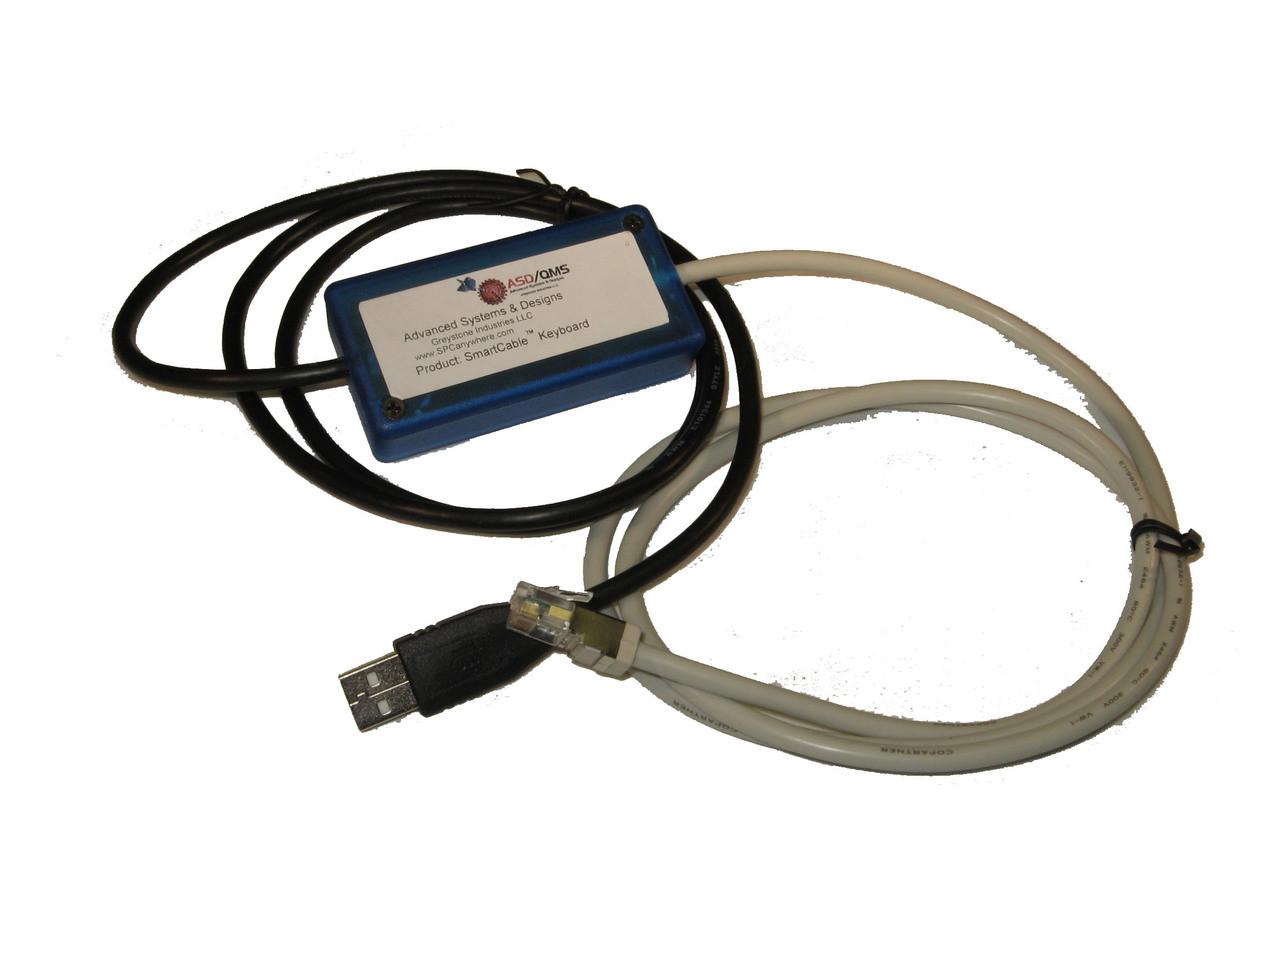 SmartCable Keyboard for Mettler Toledo PS60 Digital Scale